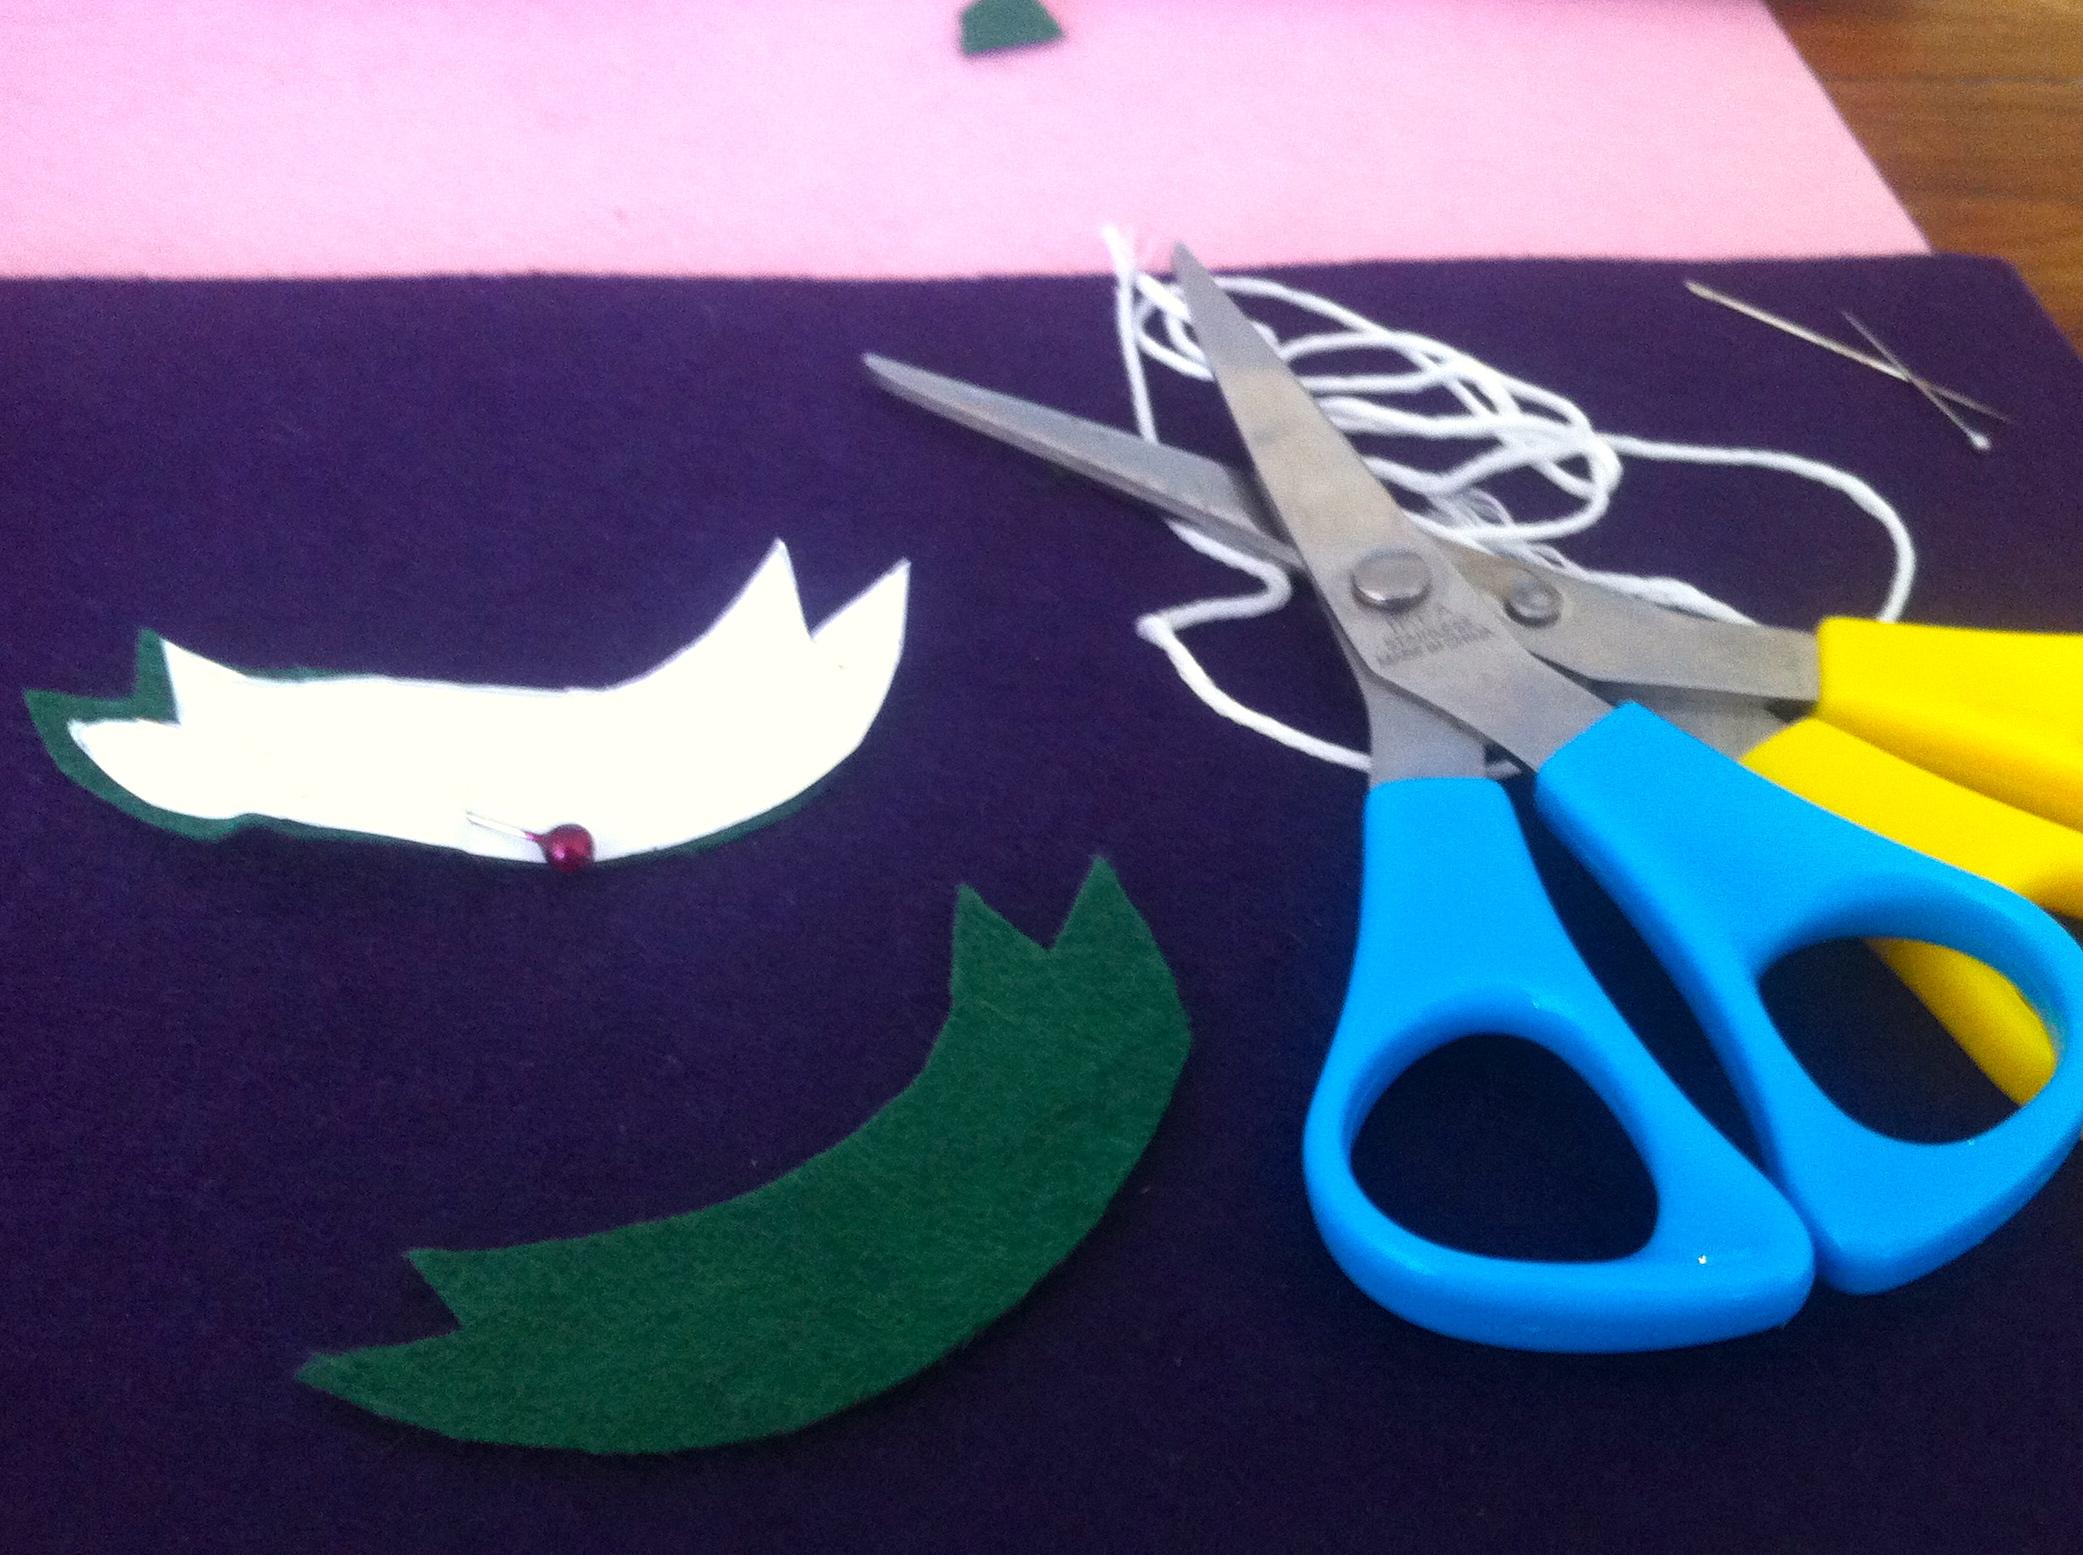 Scissors and half-made felt shapes.